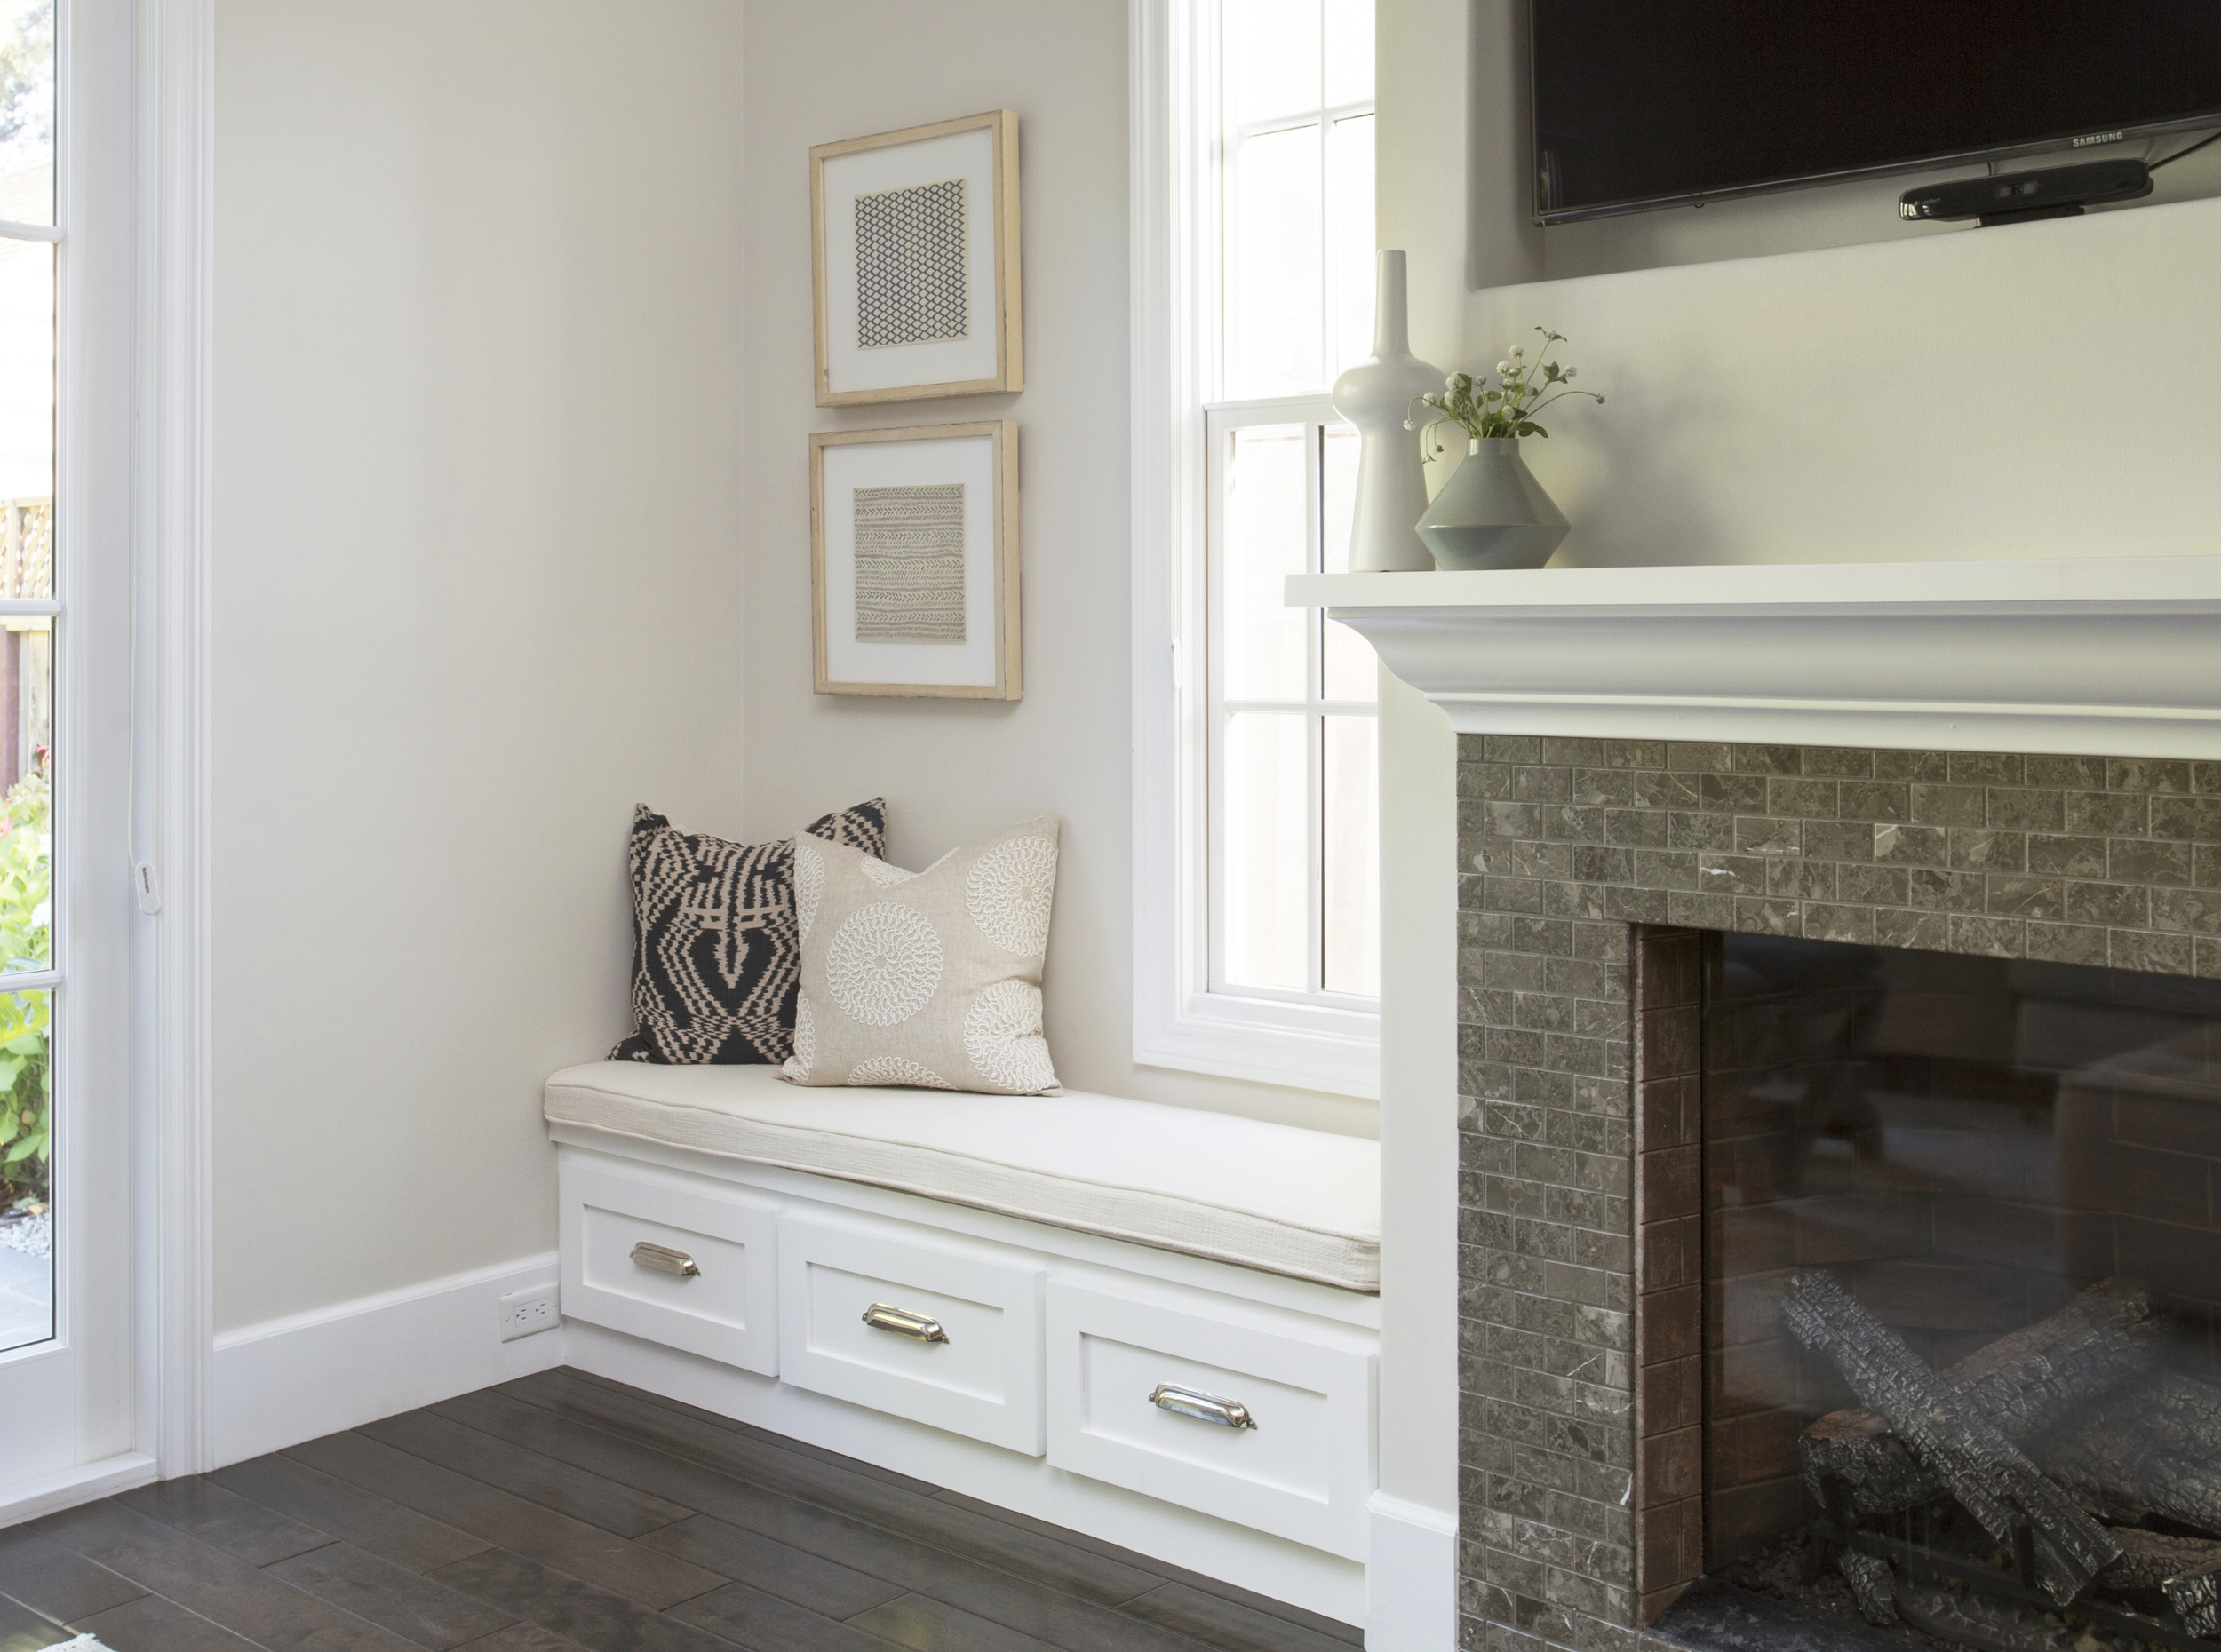 Braun + Adams Valparaiso-living room detail 1.jpg